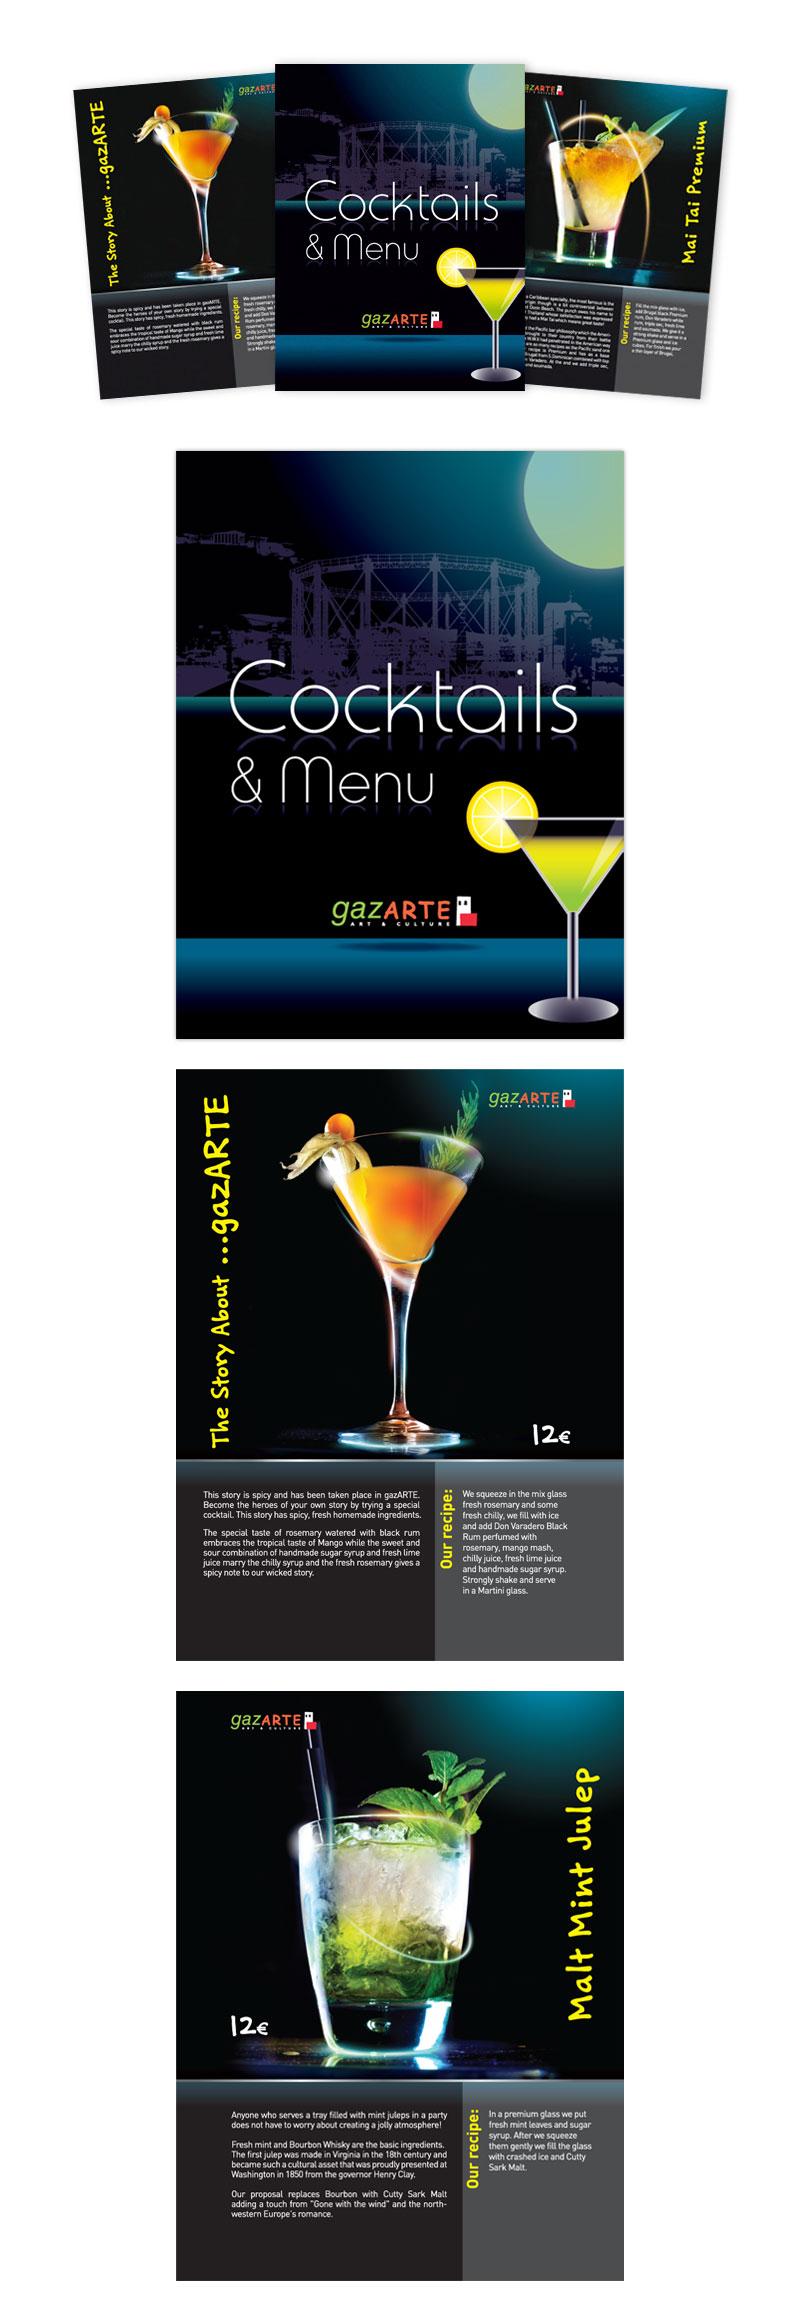 Gazarte_coctail_menu